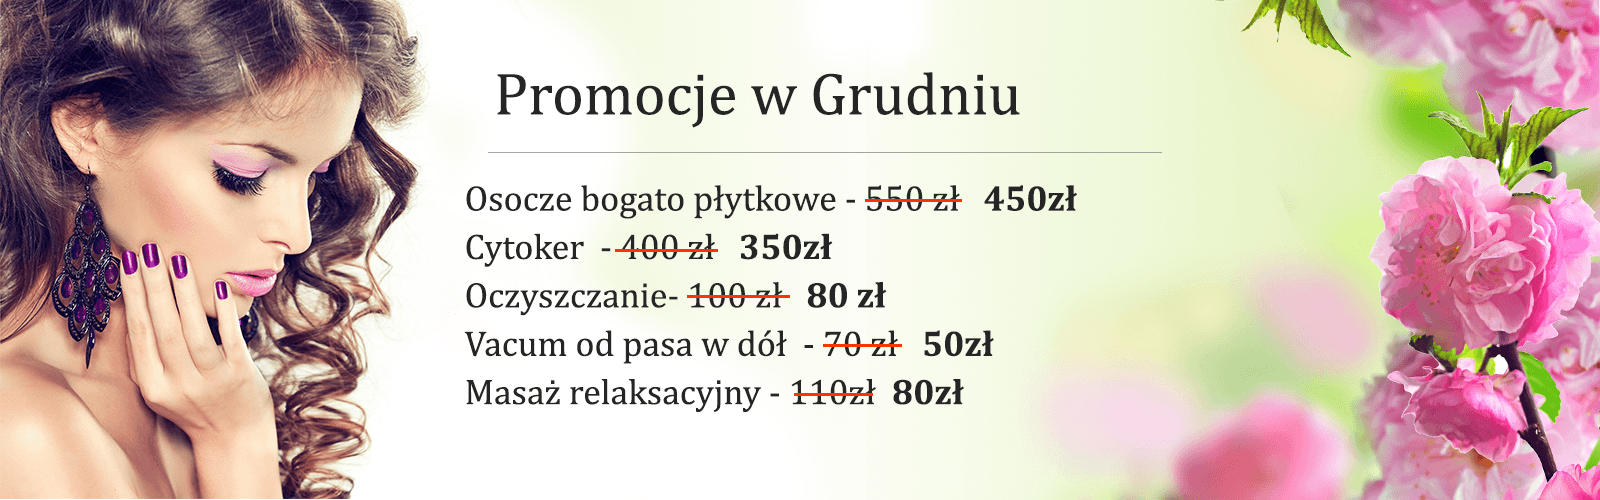 promocje-grudzien